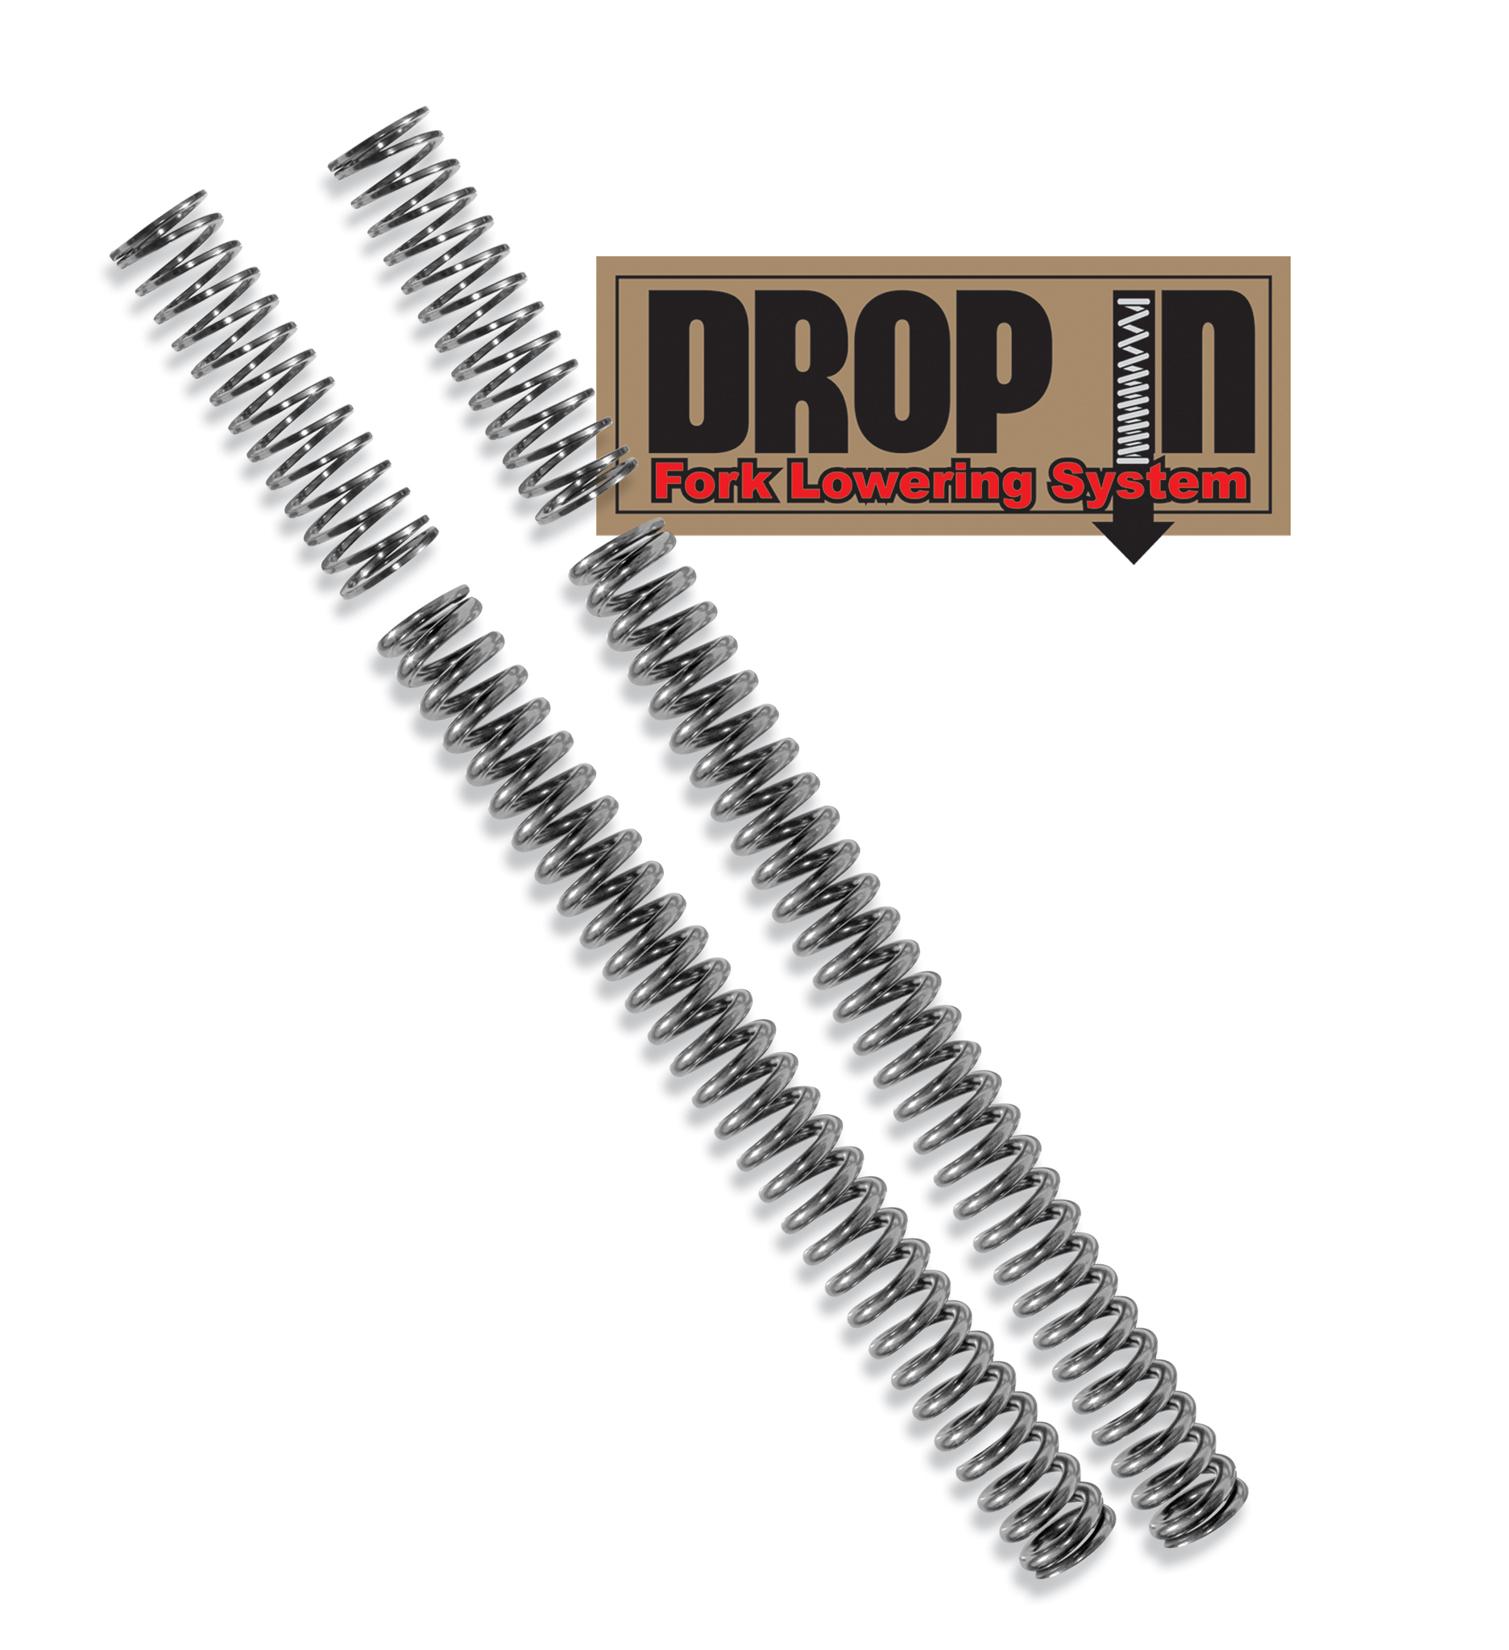 Fork Lowering Kit Quot Drop In Quot Progressive Suspension